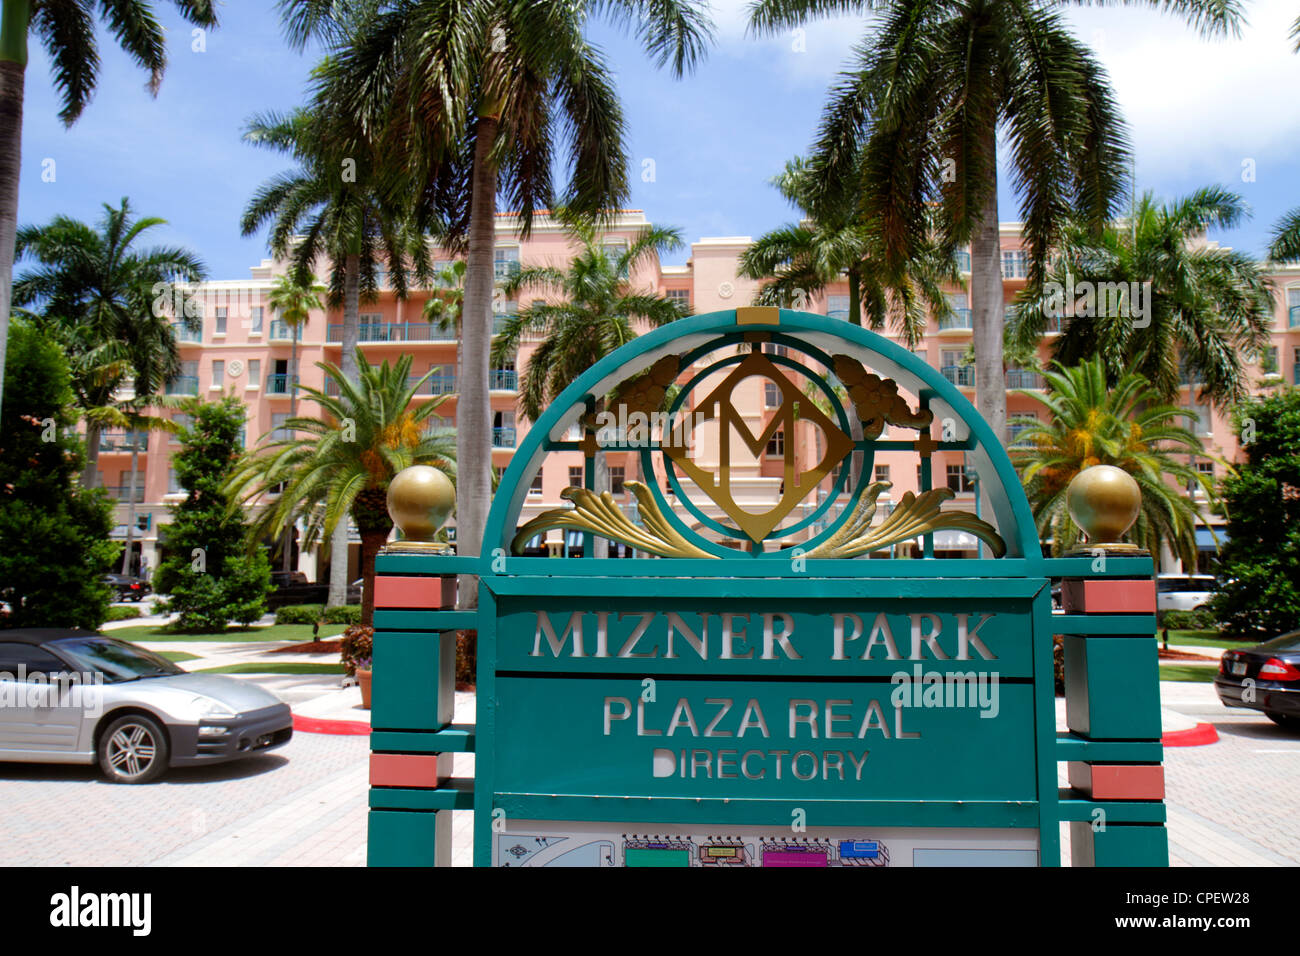 Boca Raton Shopping >> Boca Raton Florida Mizner Park Plaza Real Upscale Shopping